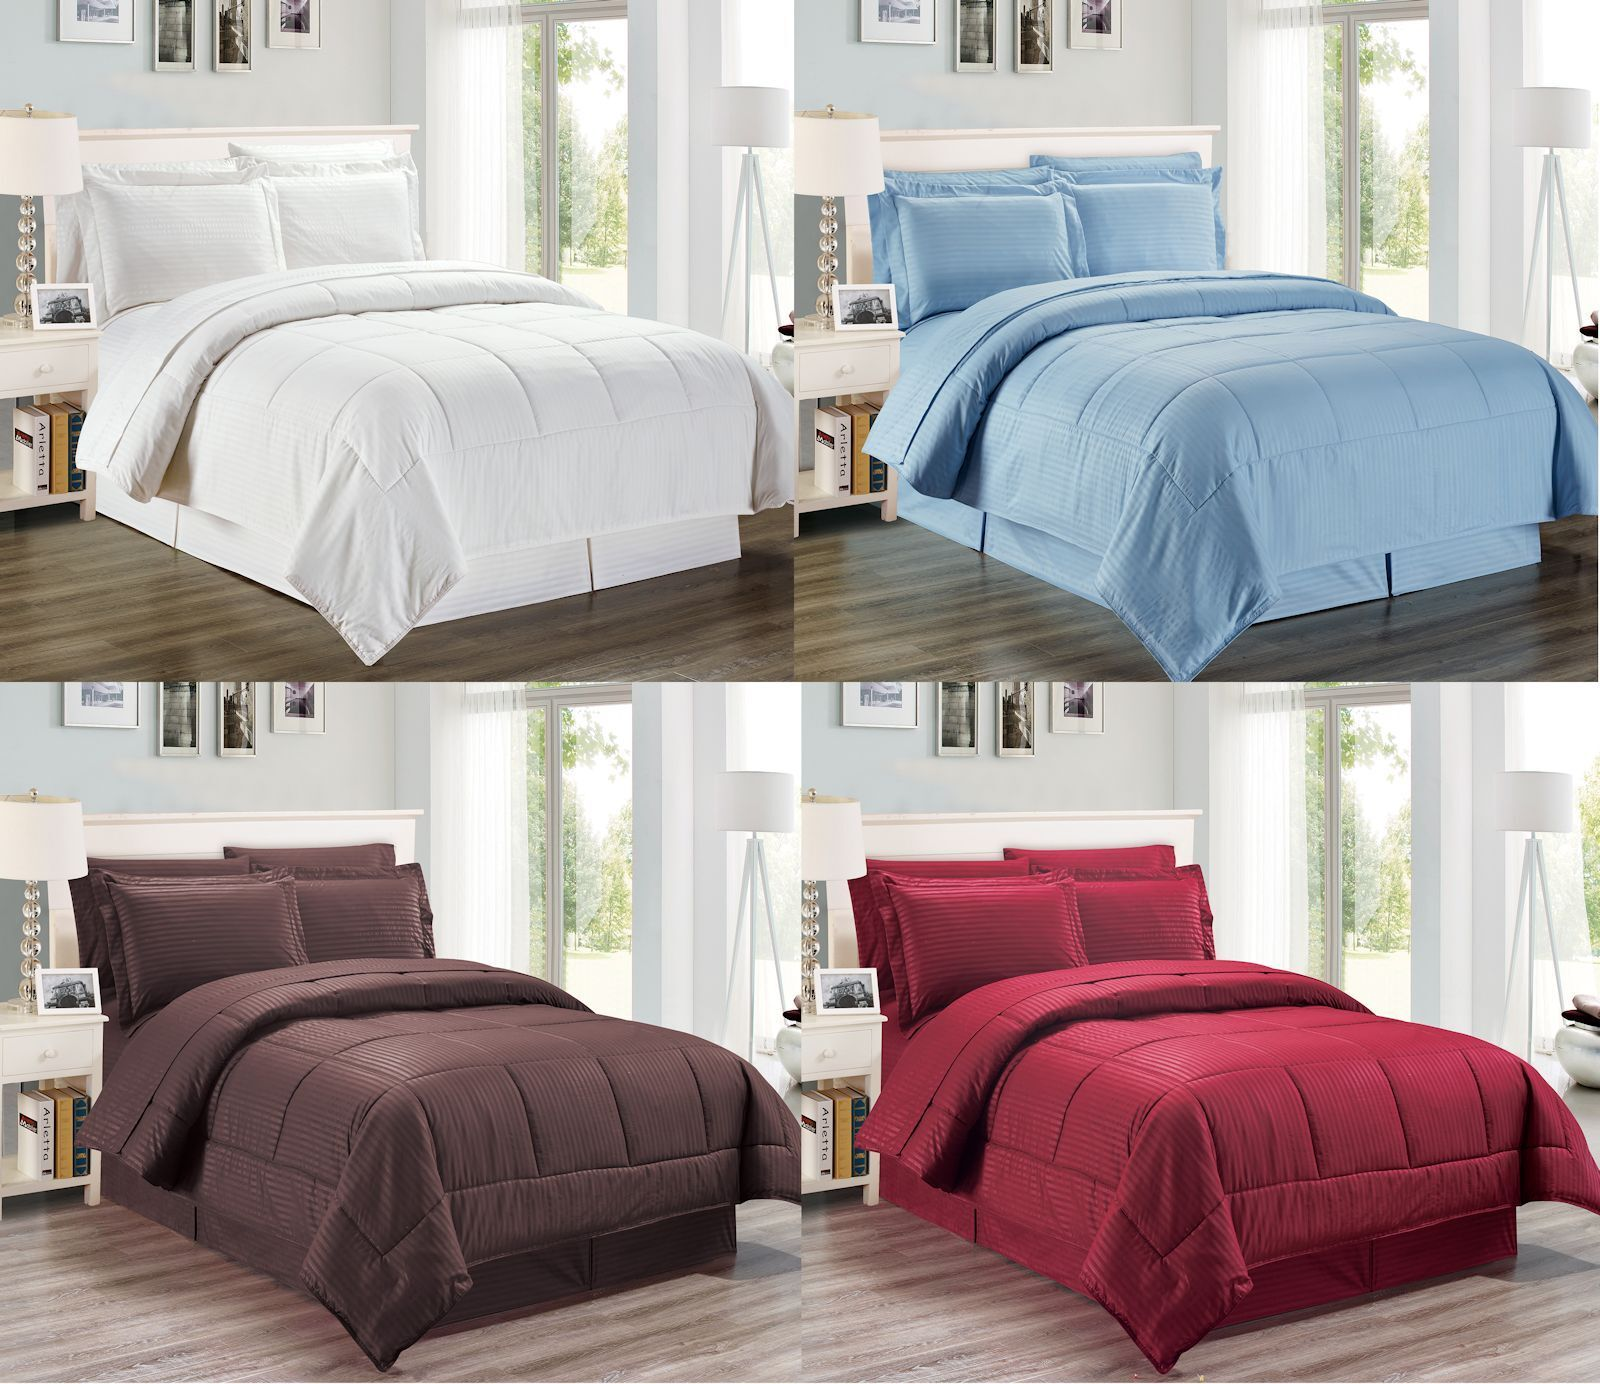 8 Pcs Reversible Wrinkle Free Comforter Set and Sheet Set, Queen & King